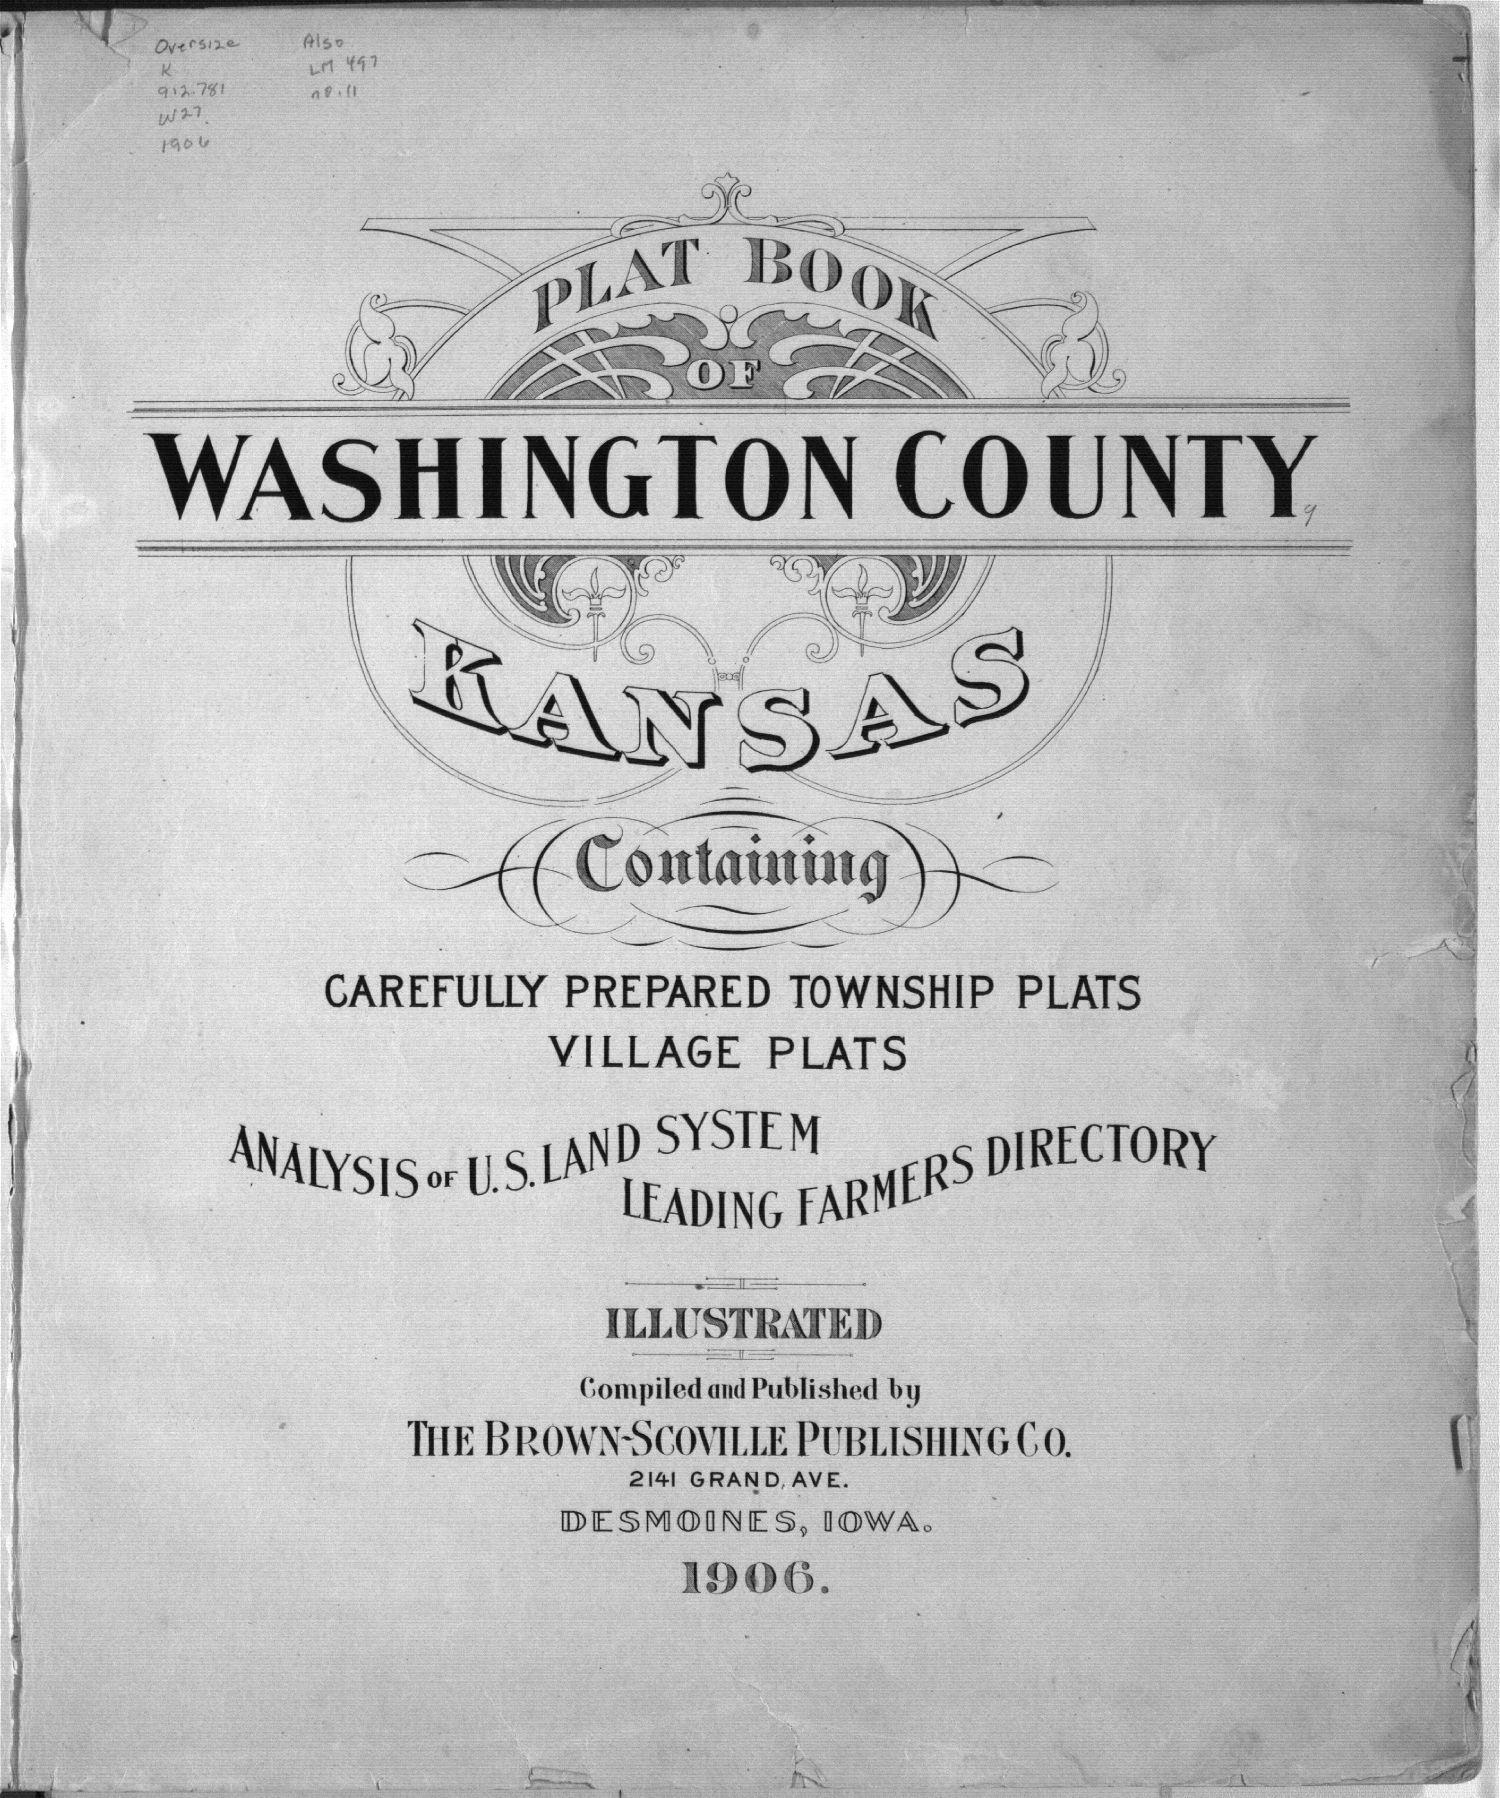 Plat book of Washington County, Kansas - Title Page